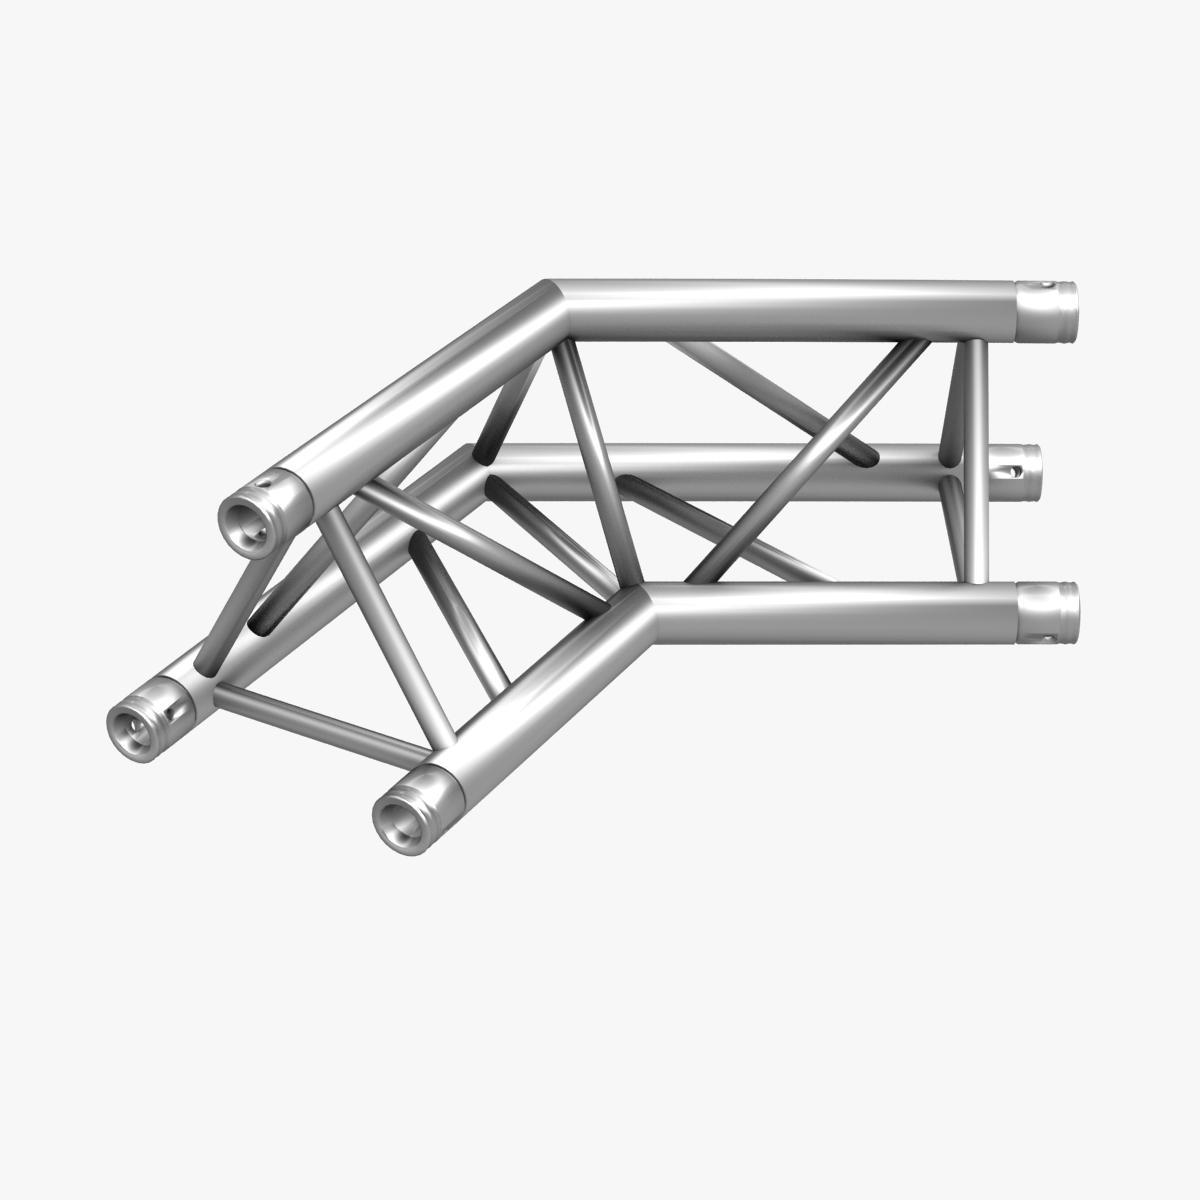 triangular trusses (collection 55 modular pieces) 3d model 3ds max dxf fbx c4d dae texture obj 216244